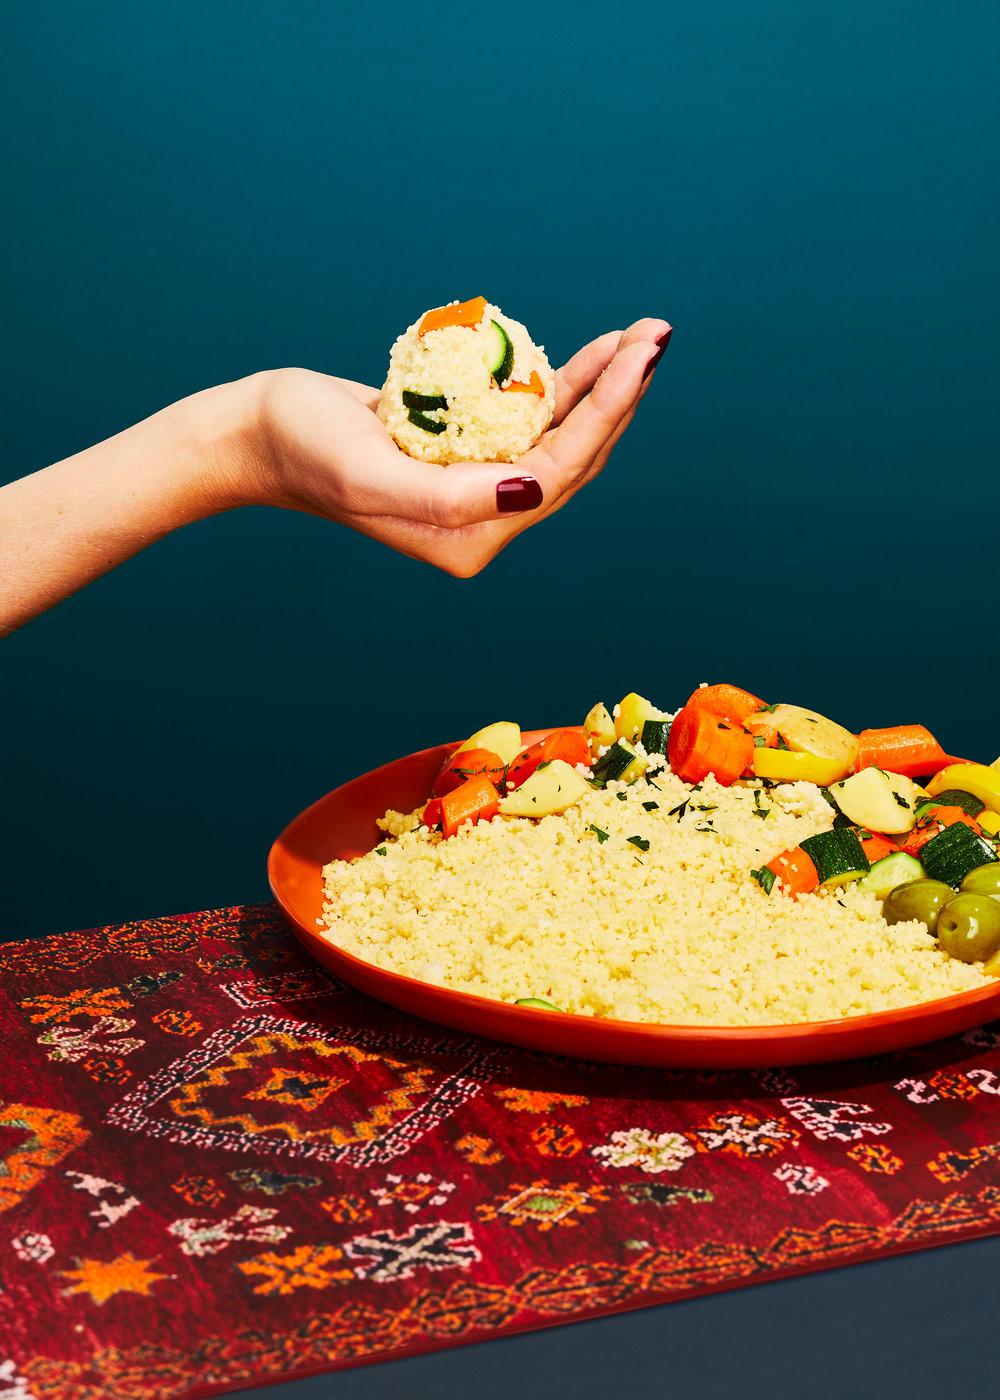 fabric_of_food_morocco.jpg